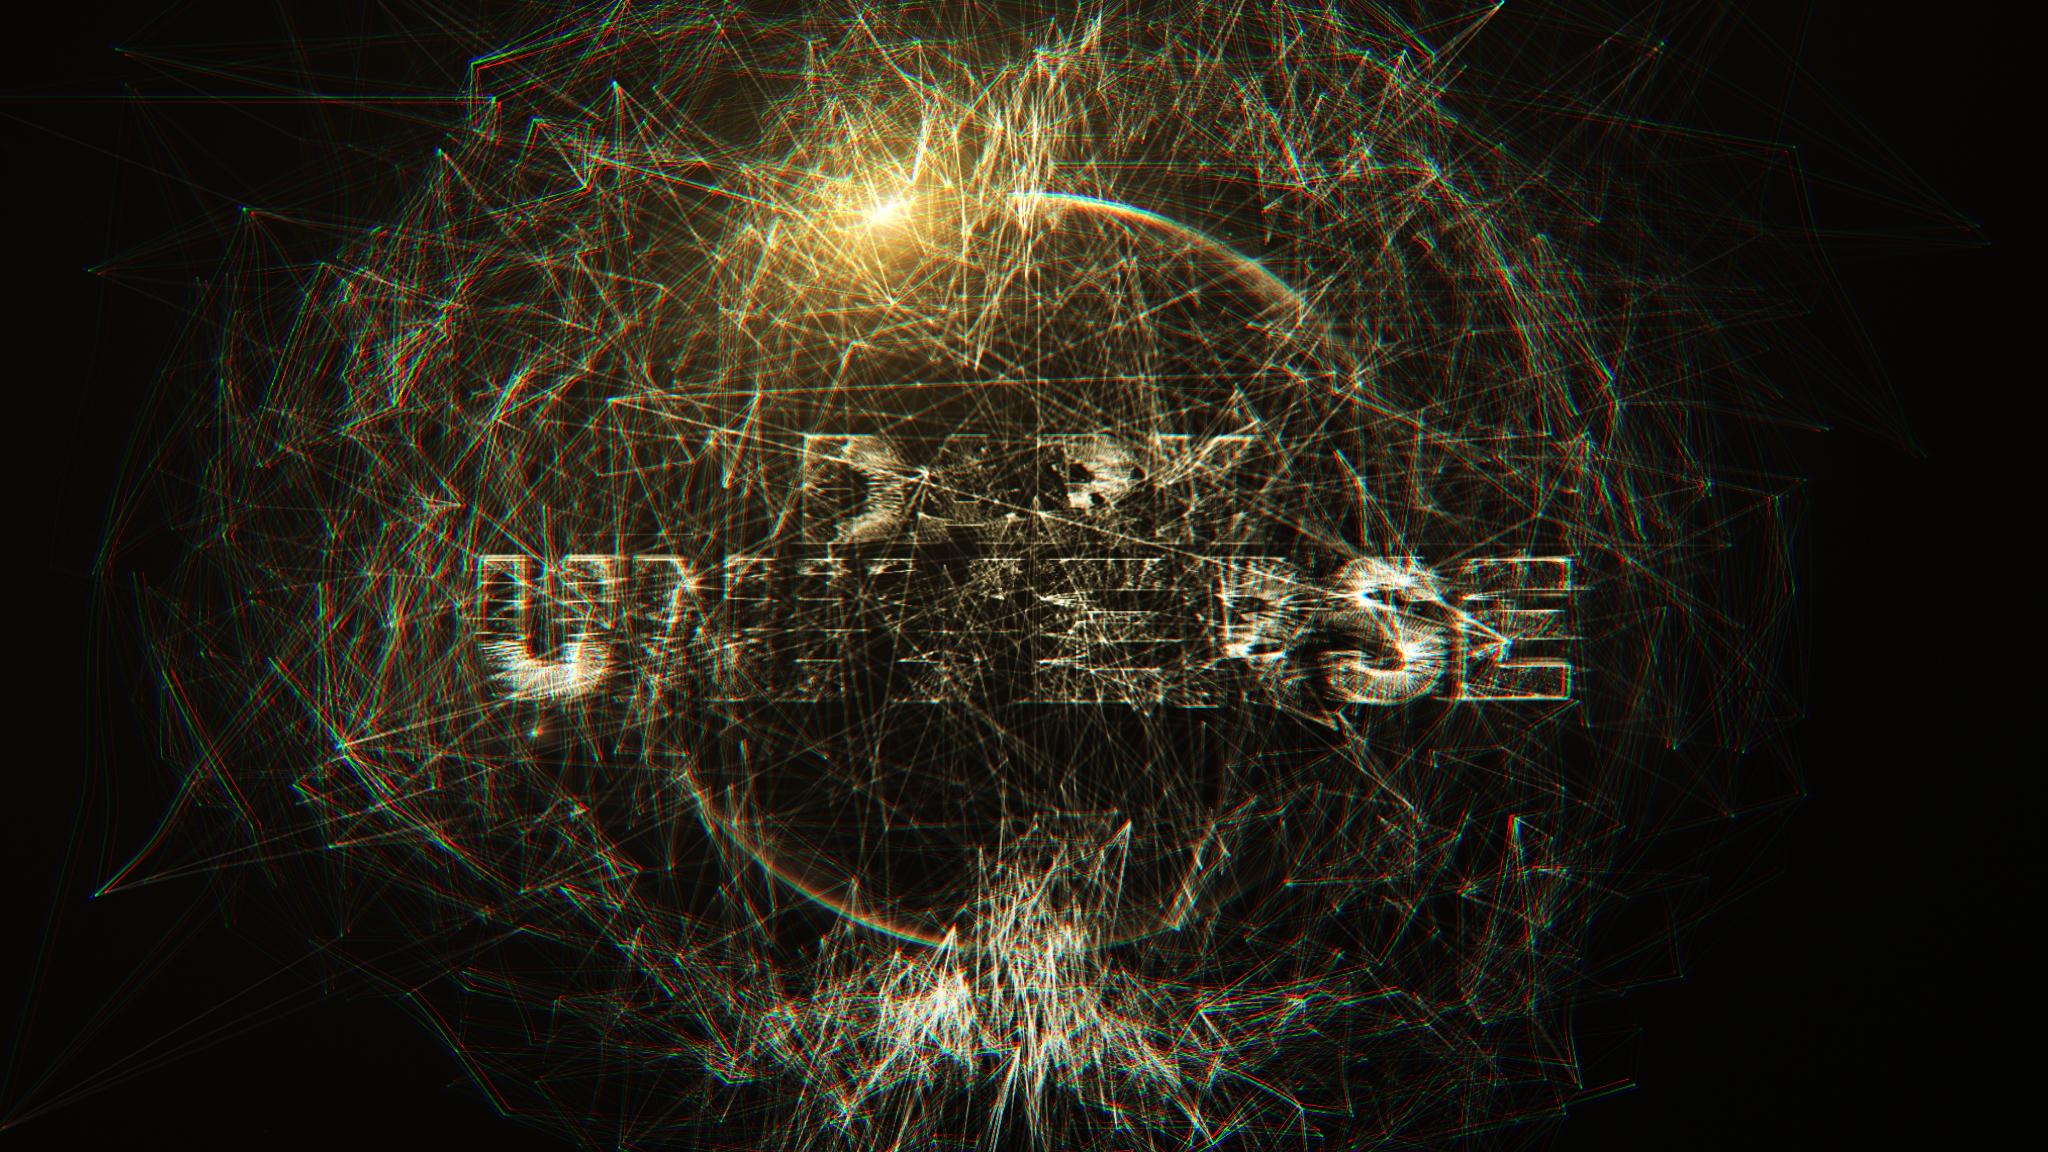 DARK_UNI_01_UNIVERSAL_v06d_AK_HD copy.jpg